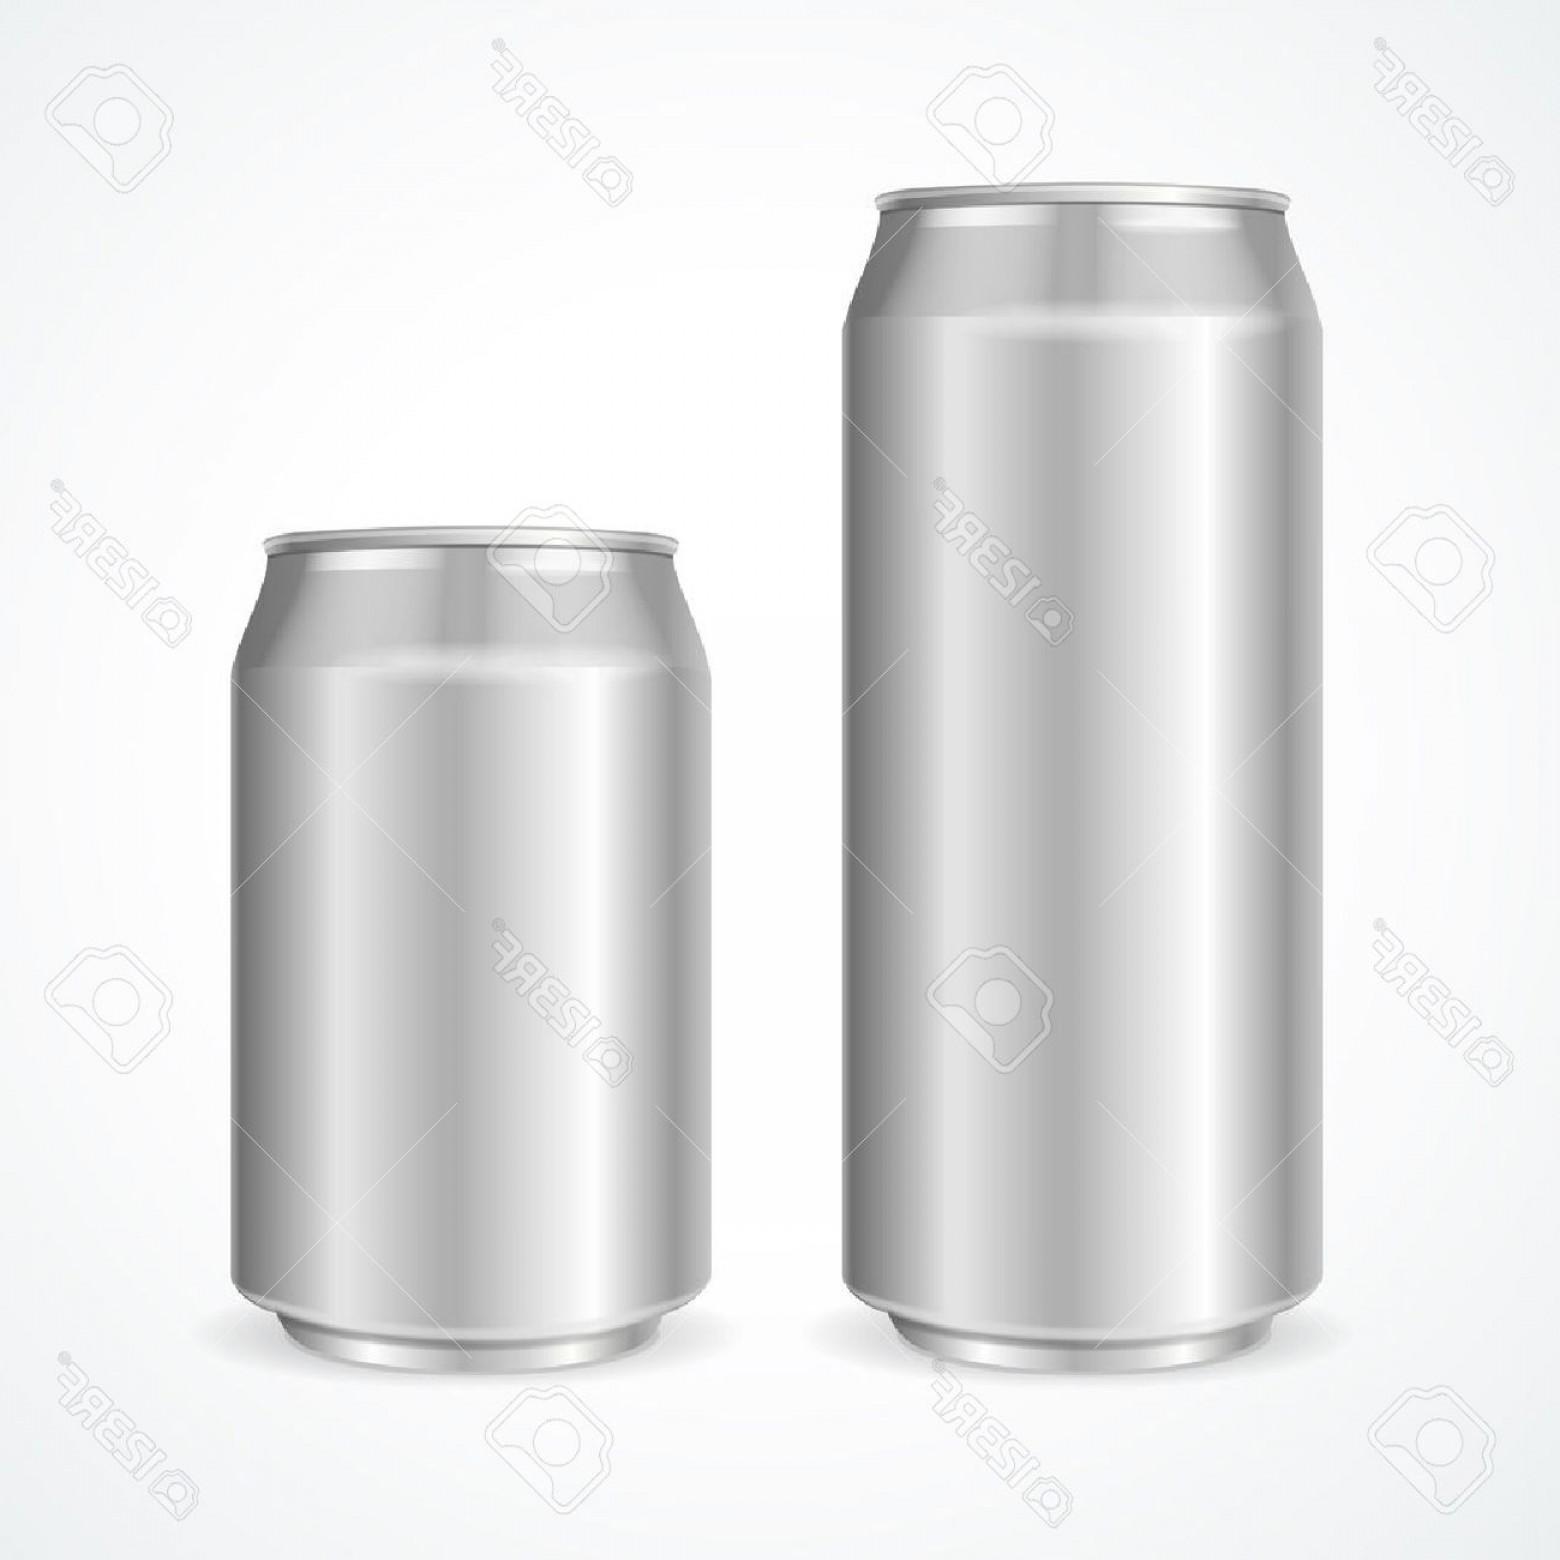 1560x1560 Photostock Vector Aluminum Cans Empty And Ml Vector Illustration